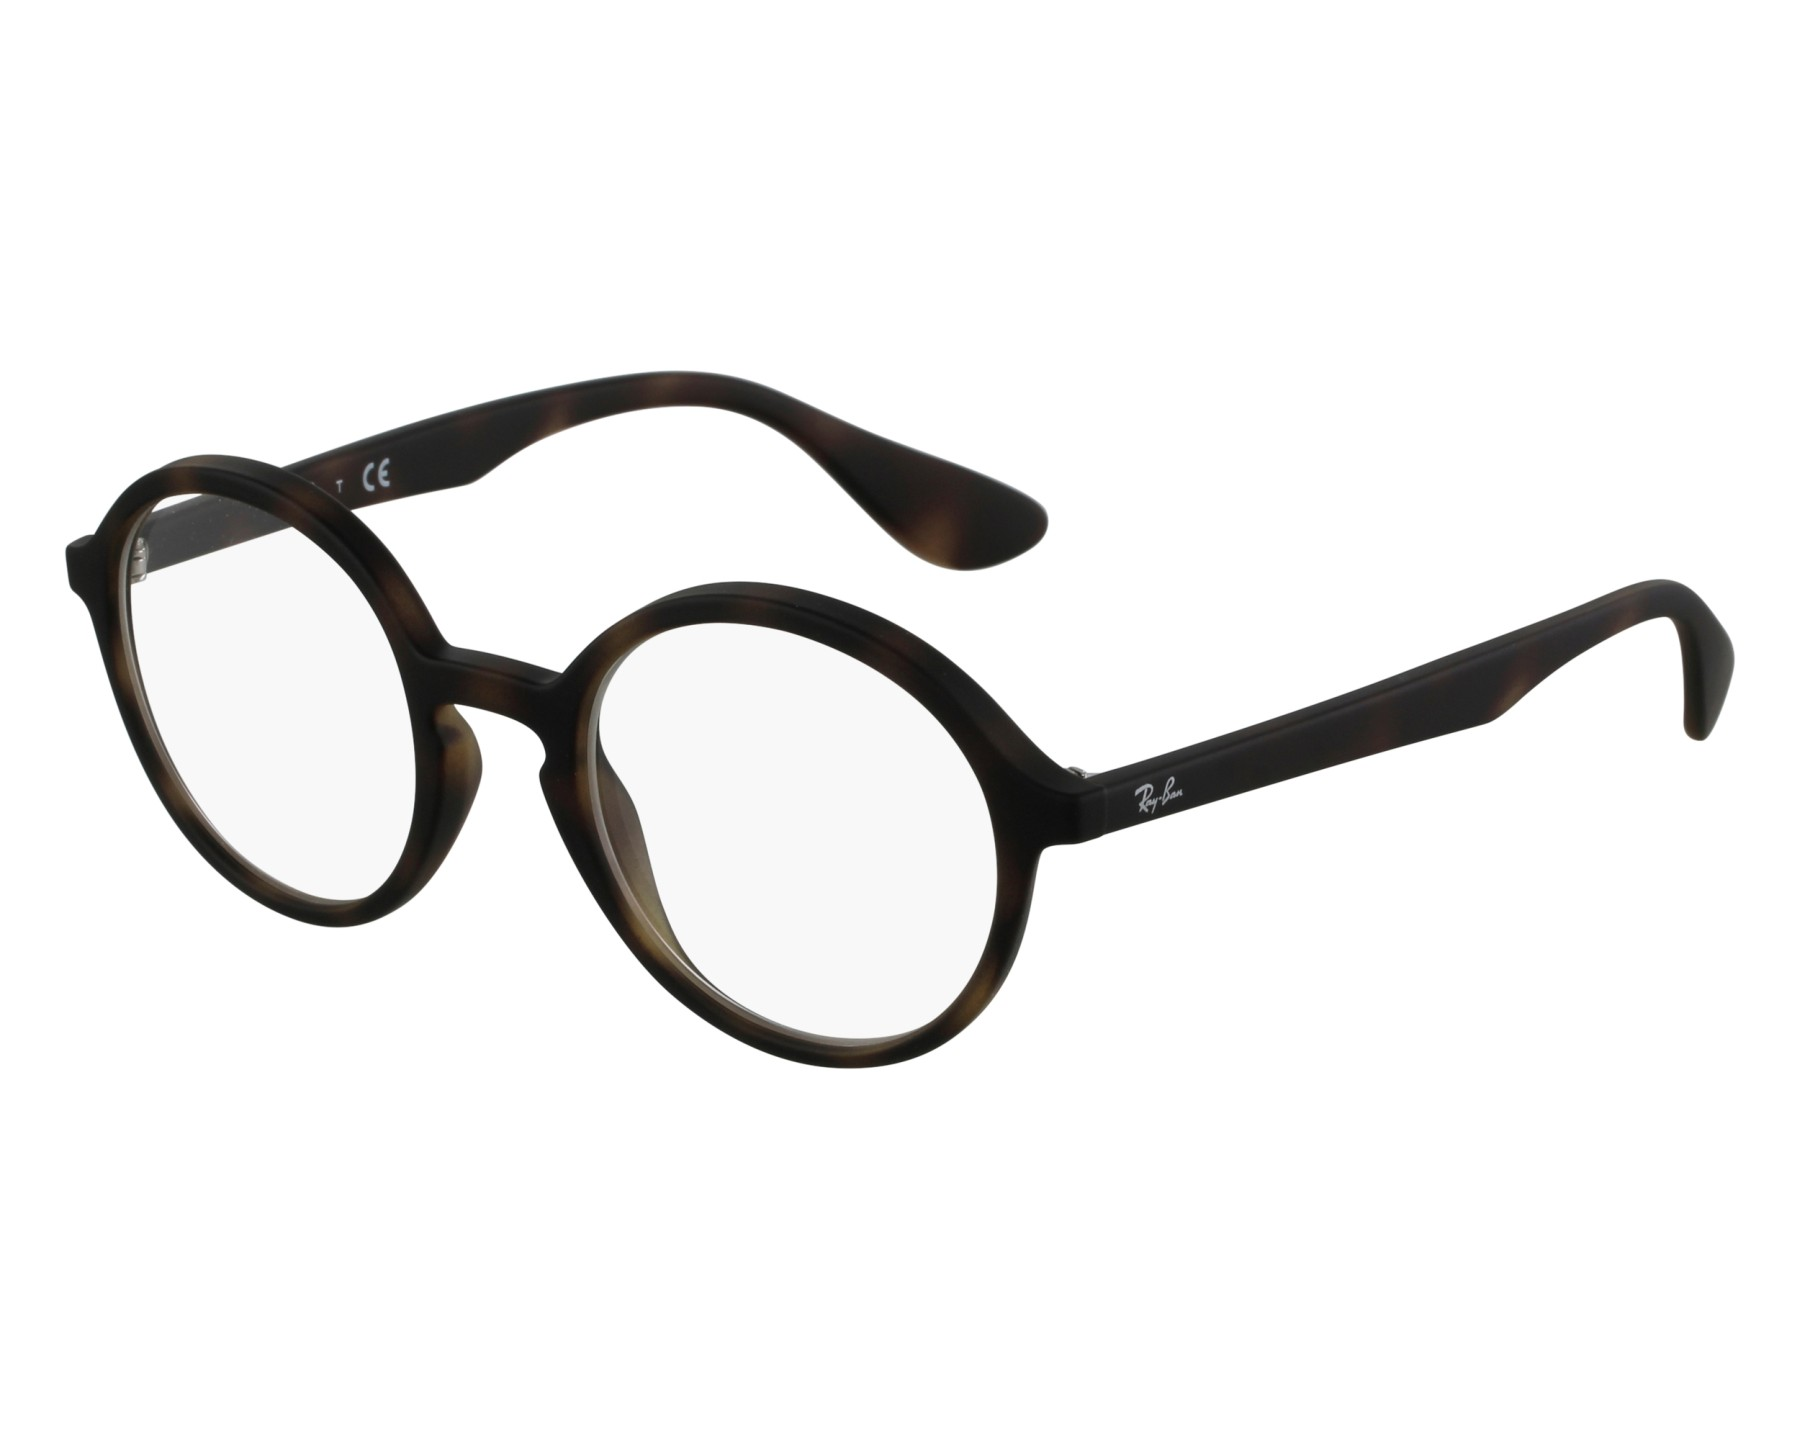 eyeglasses Ray-Ban RX-7075 5365 47-20 Havana front view 541cb7c7eeccd